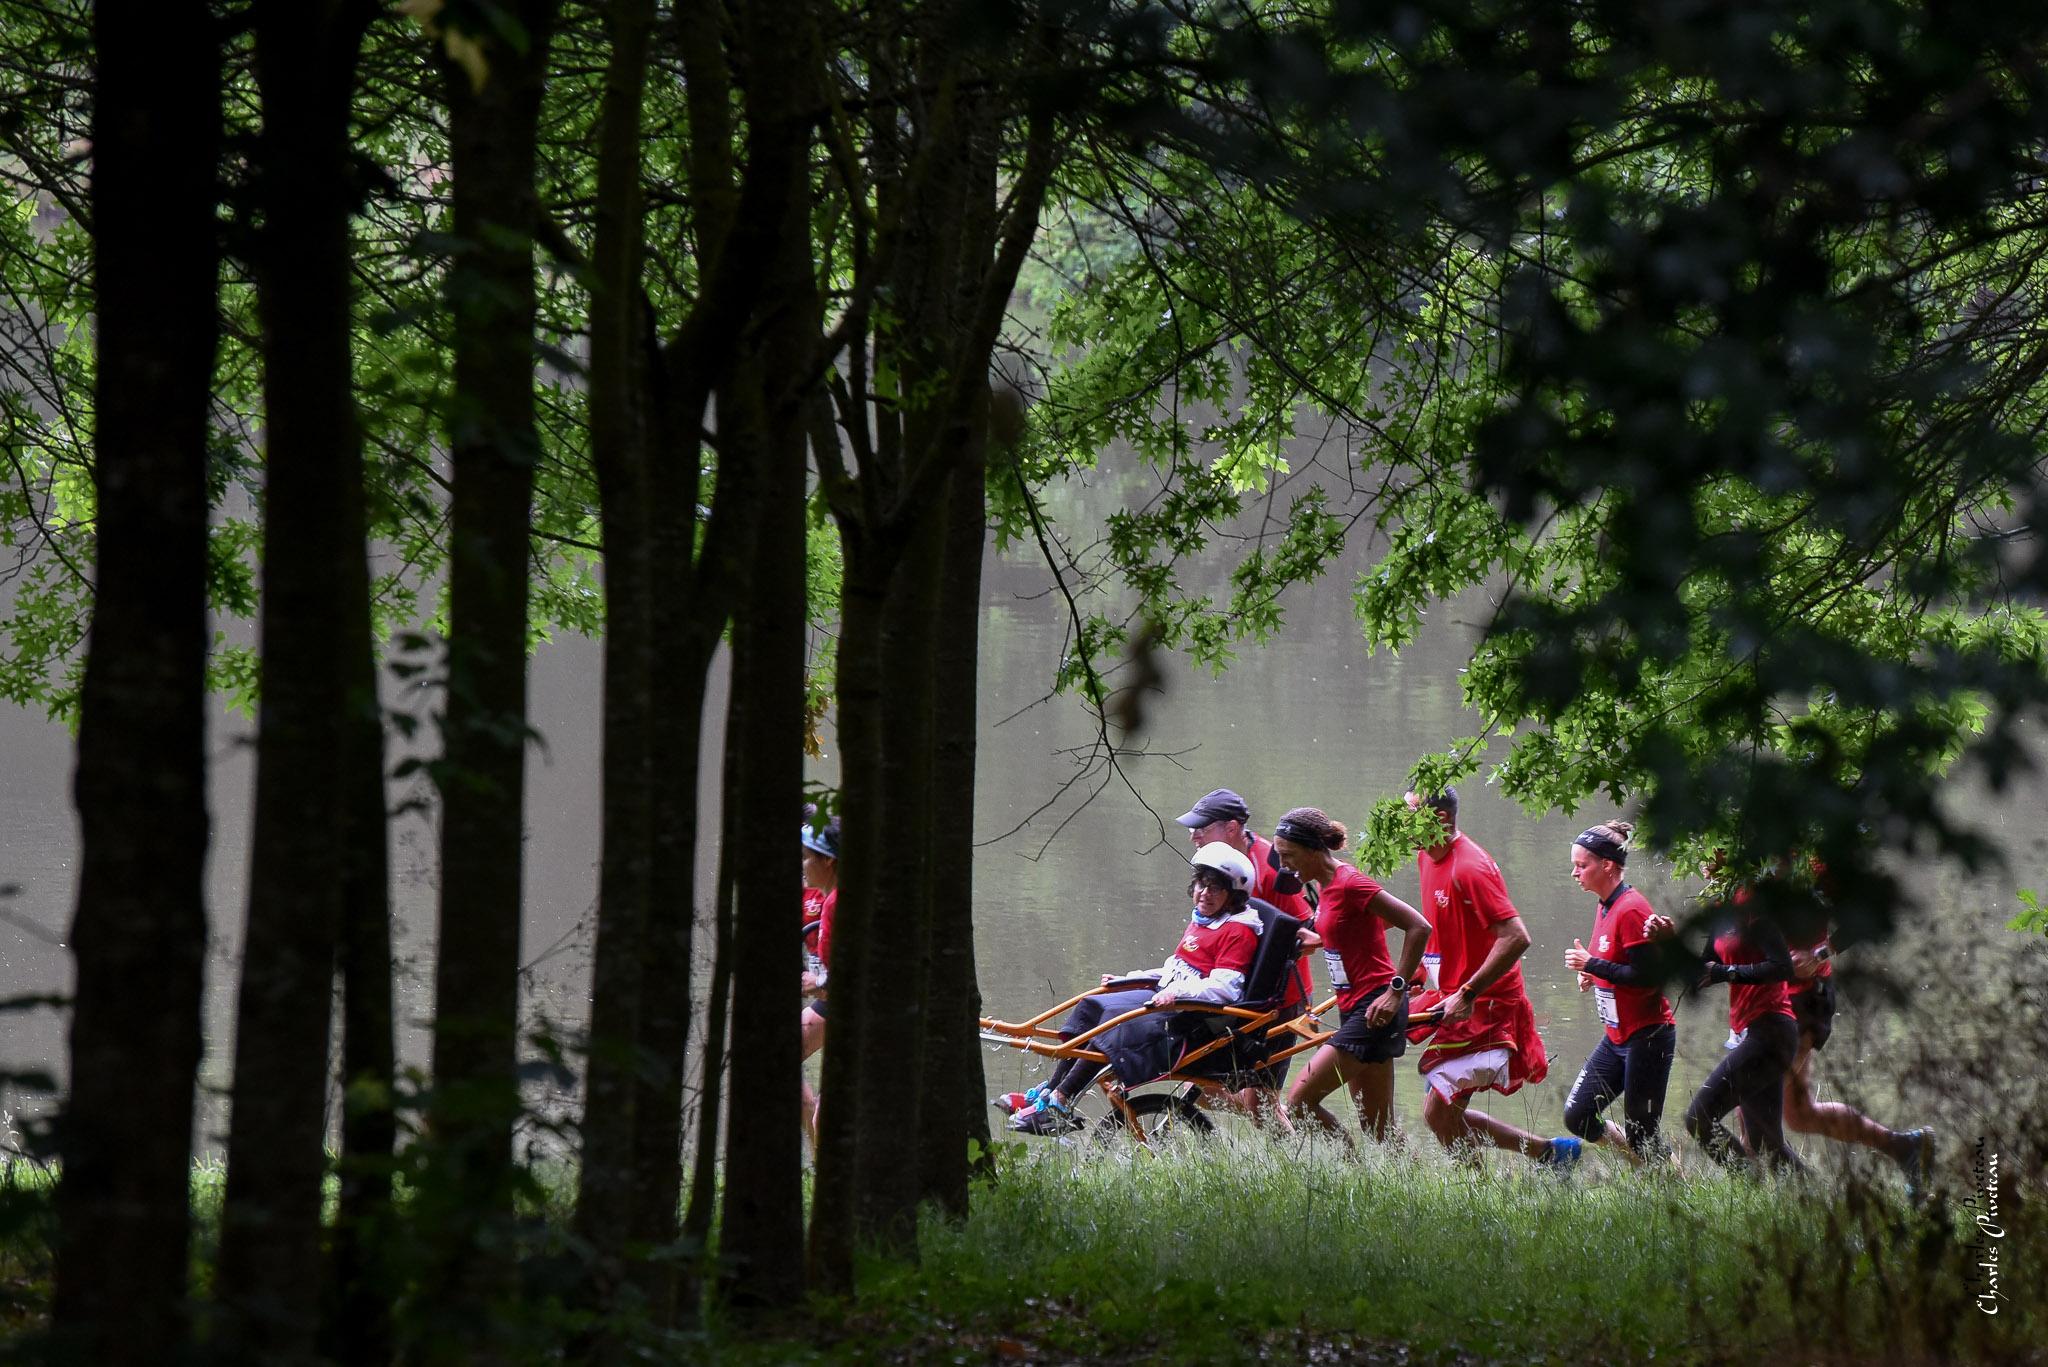 08-2017-07-09 10km Aizenay- Dans les bois - Joelette No 1 (photo Charles Piveteau)